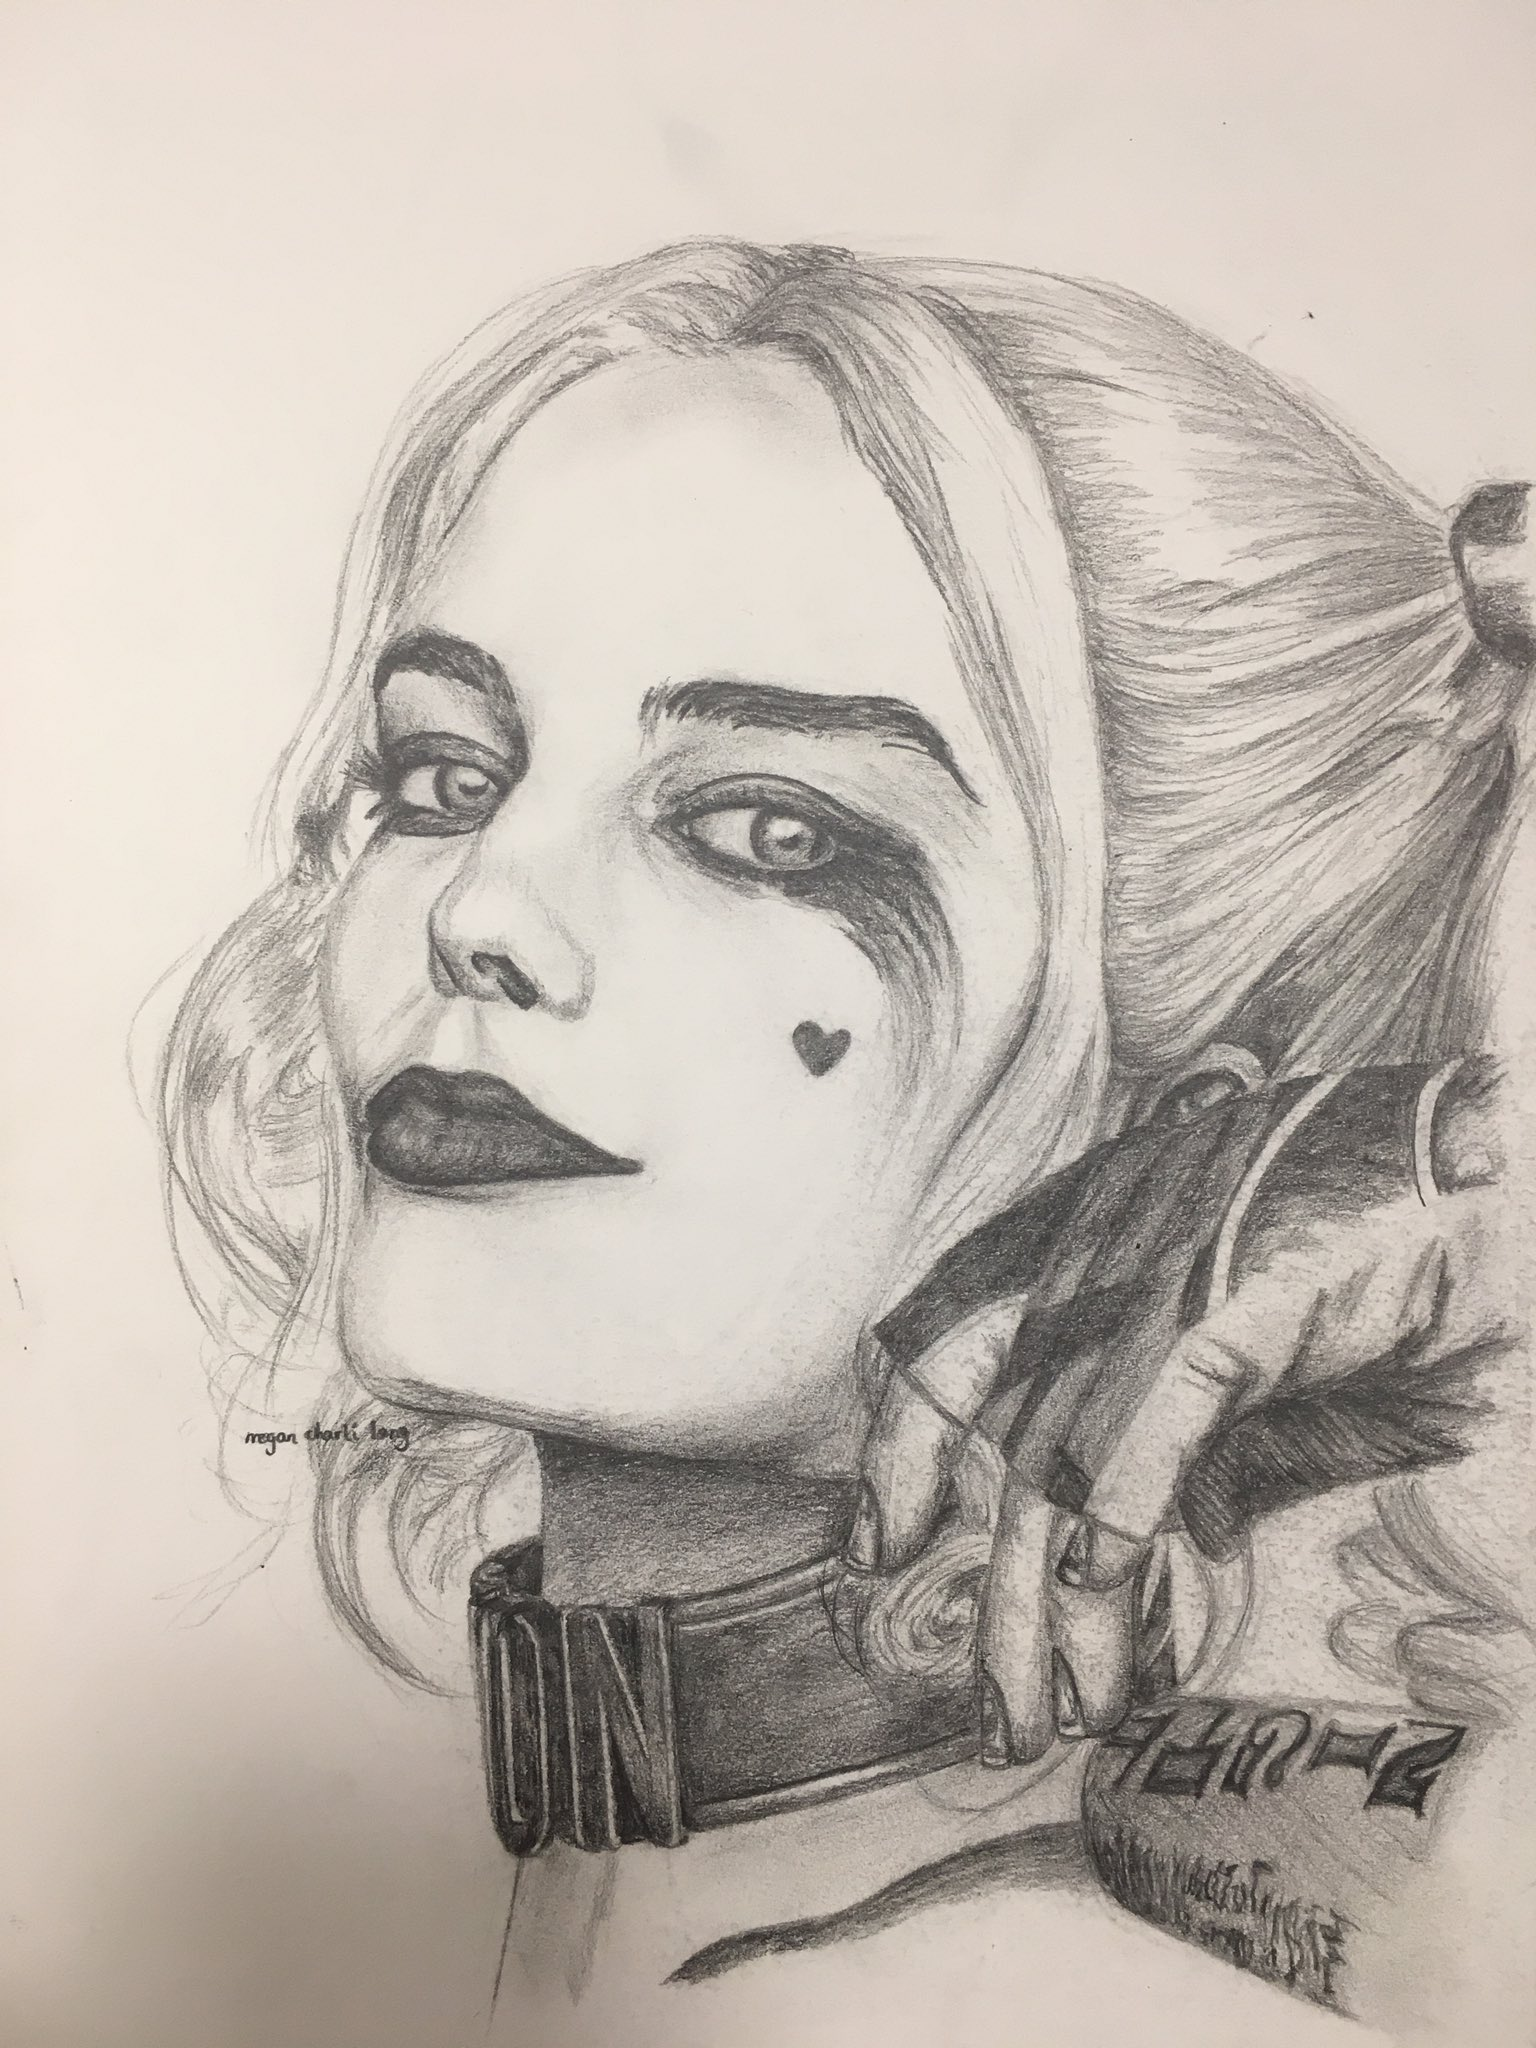 Megan Charli Art On Twitter Hand Drawn Portrait Of Harley Quinn Art Artist Pencildrawing Harleyquinn Margotrobbie Suicidesquad Realism